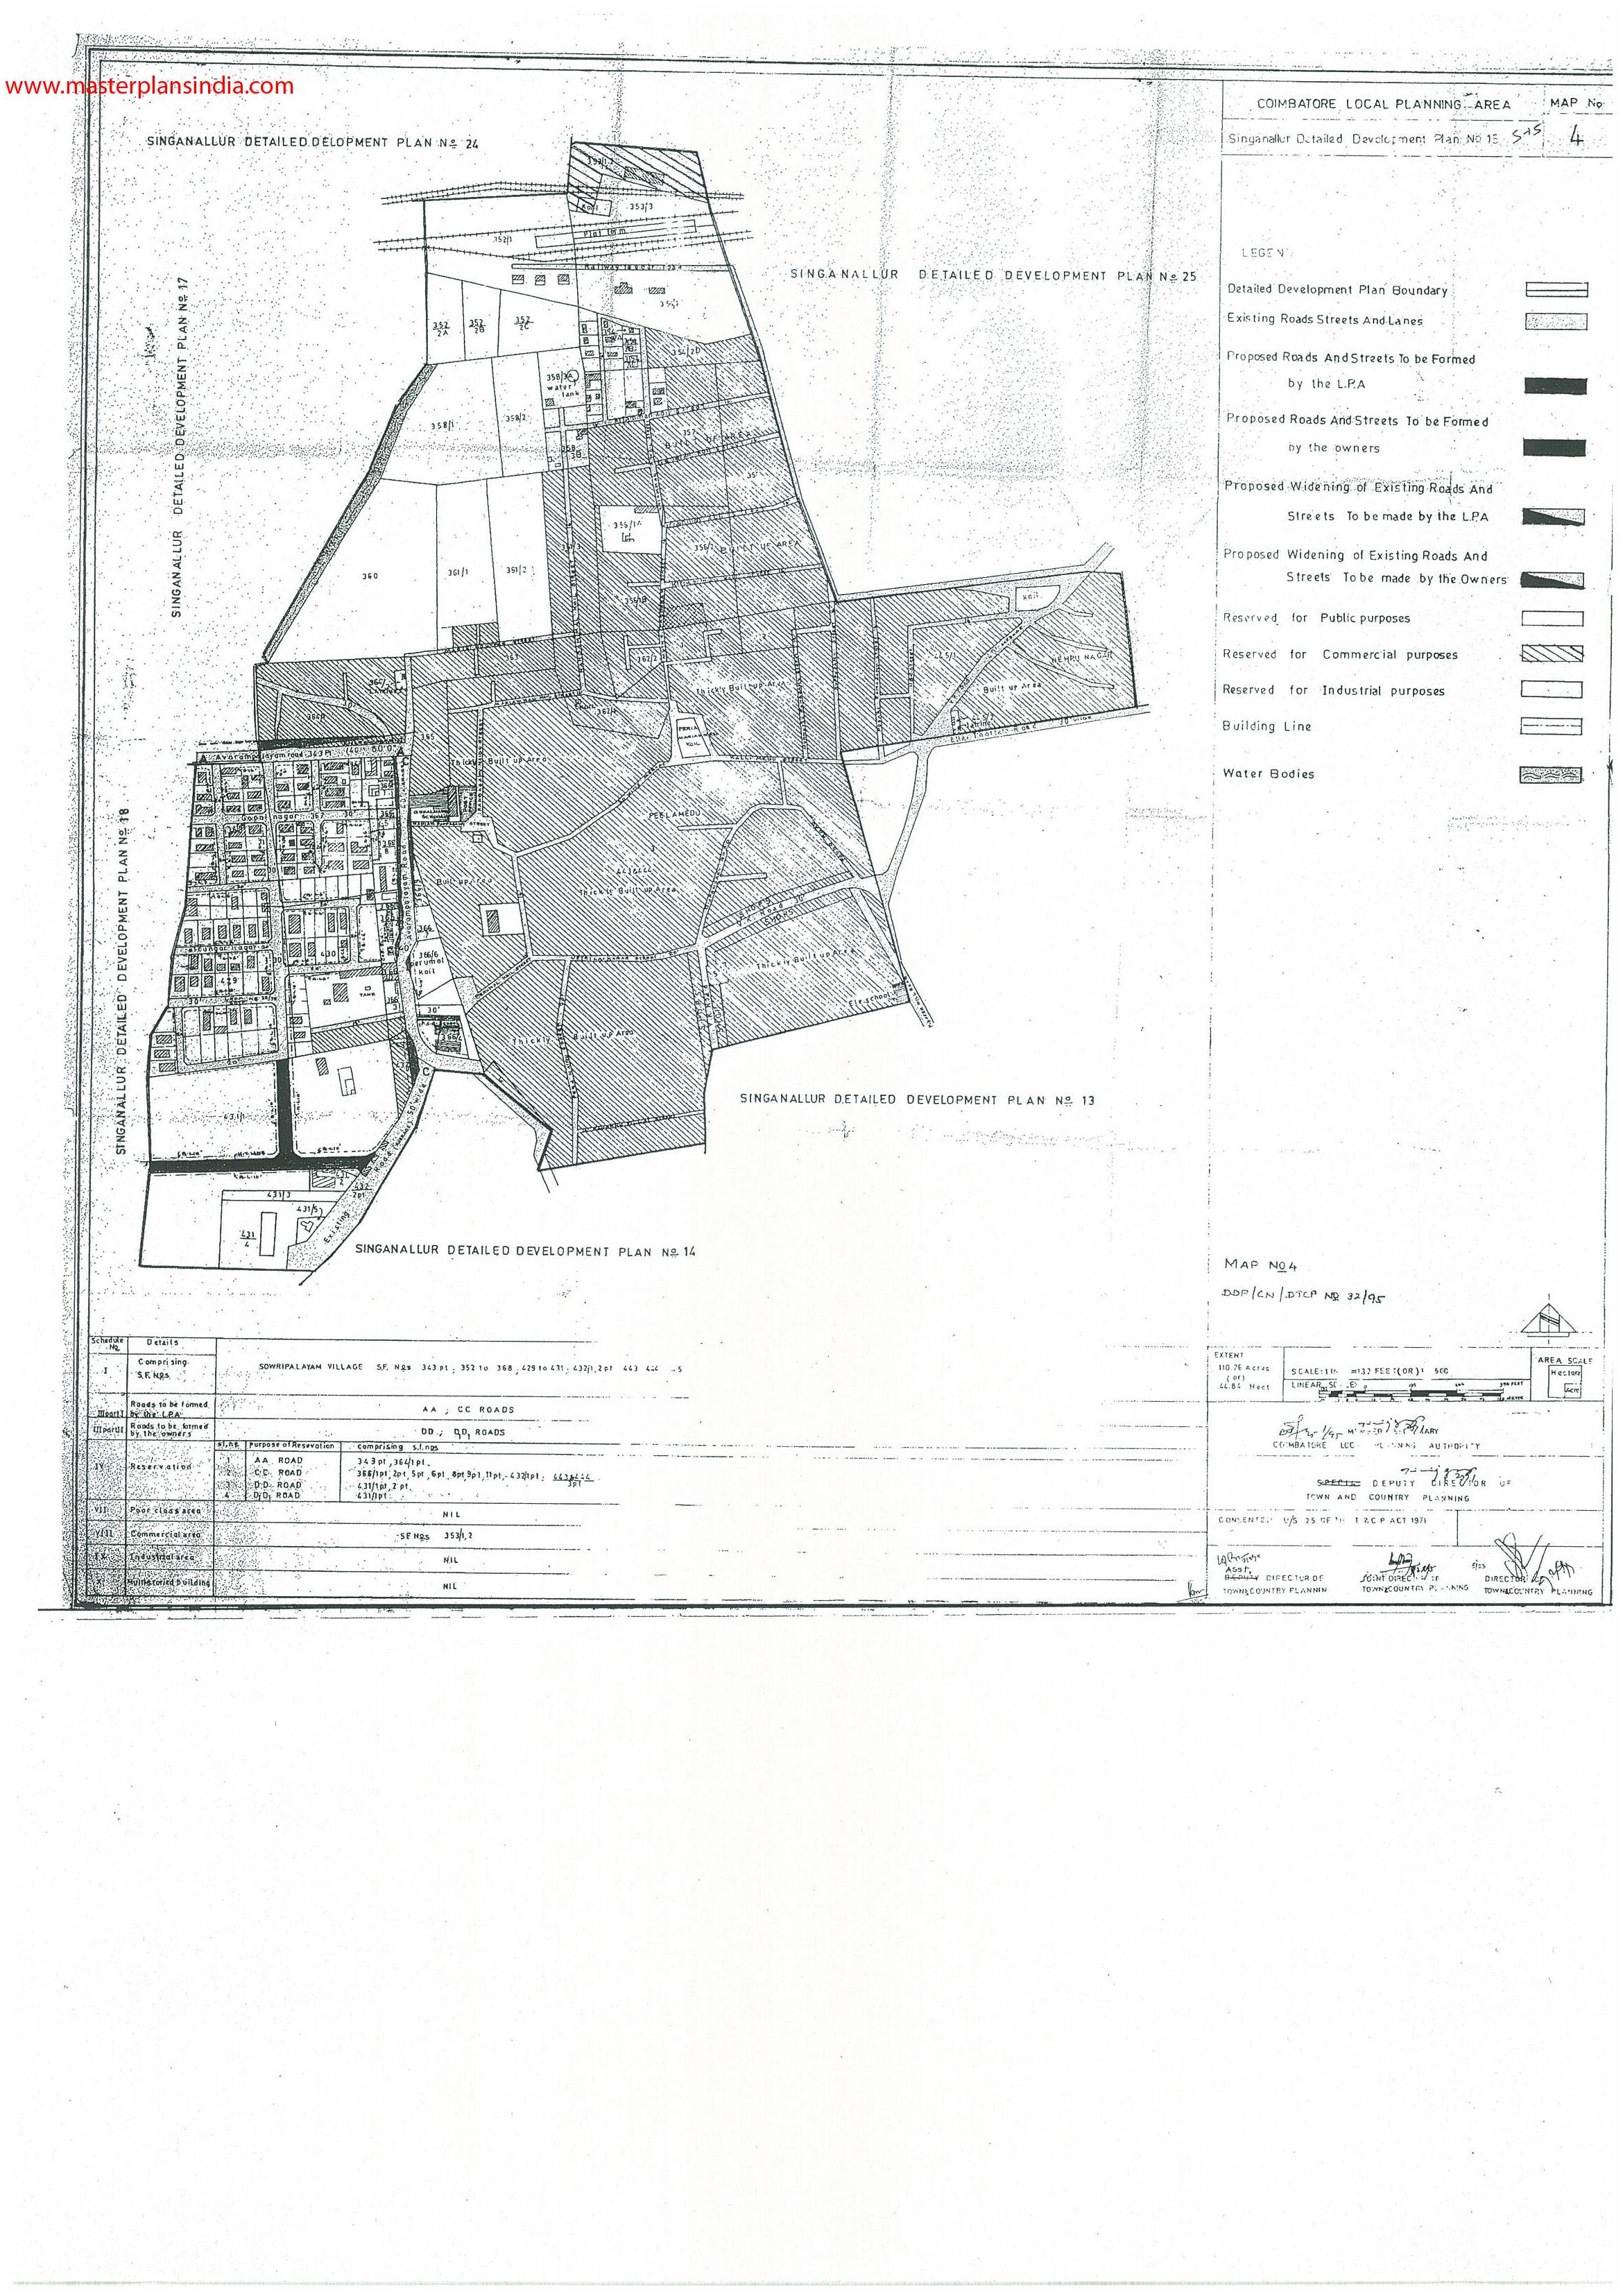 singlur-detailed-development-plan-15 Job Application Form Pdf India on dunkin donuts, printable basic, pizza hut, print out, panera bread, dollar tree, letter format sample,